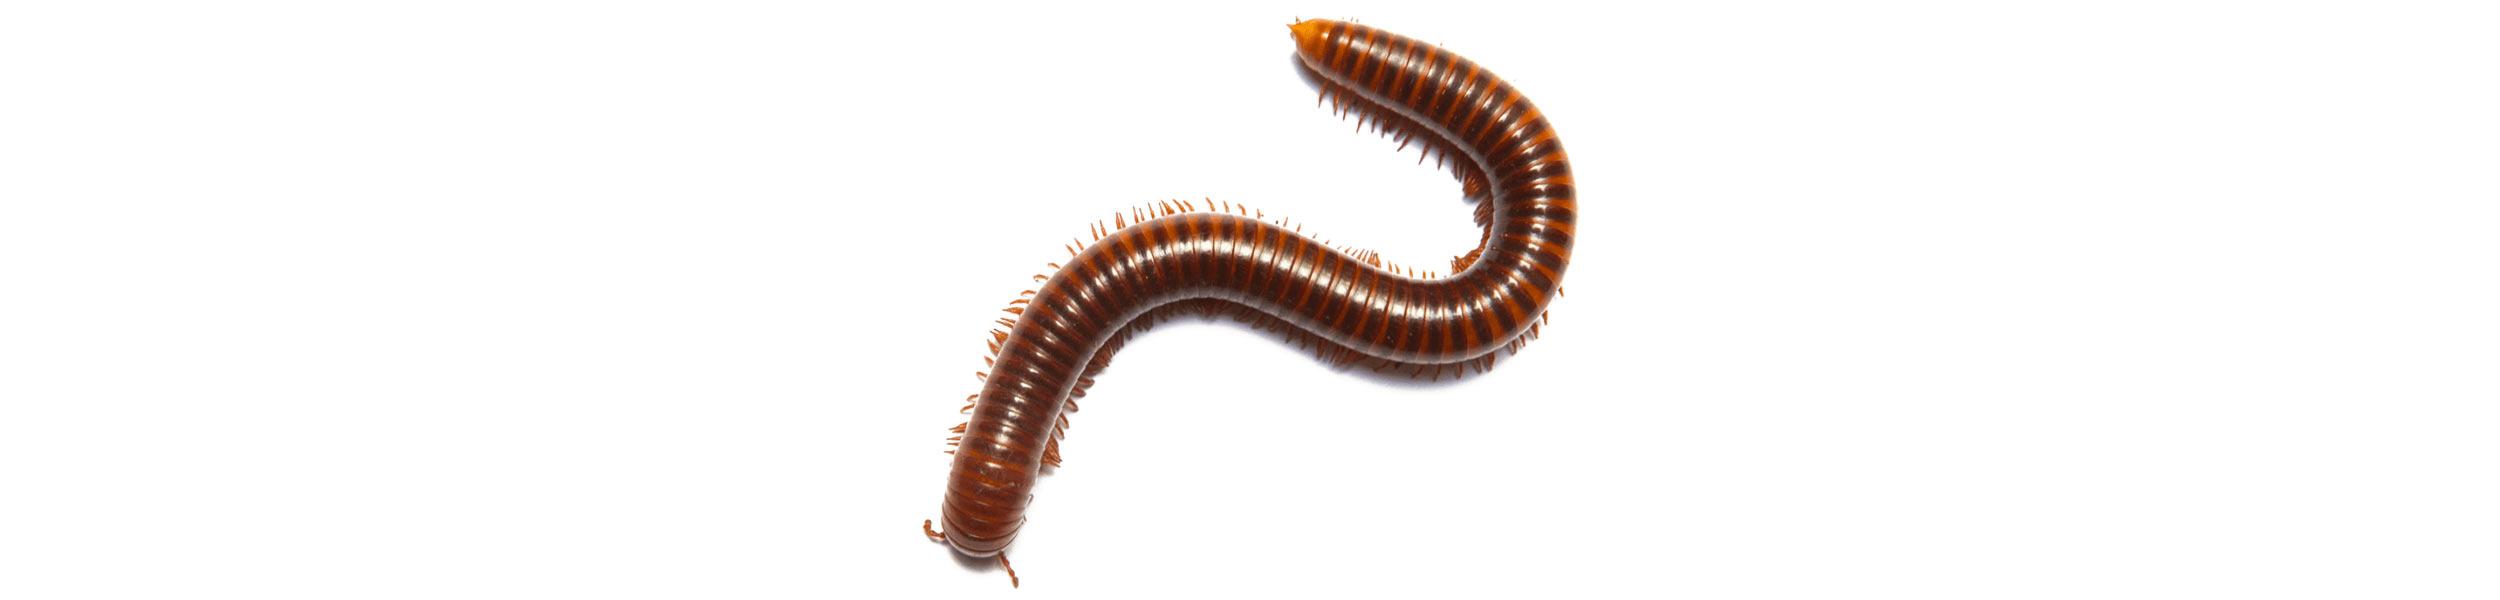 ACE Exterminating-Pest-Control-Millipede-Header